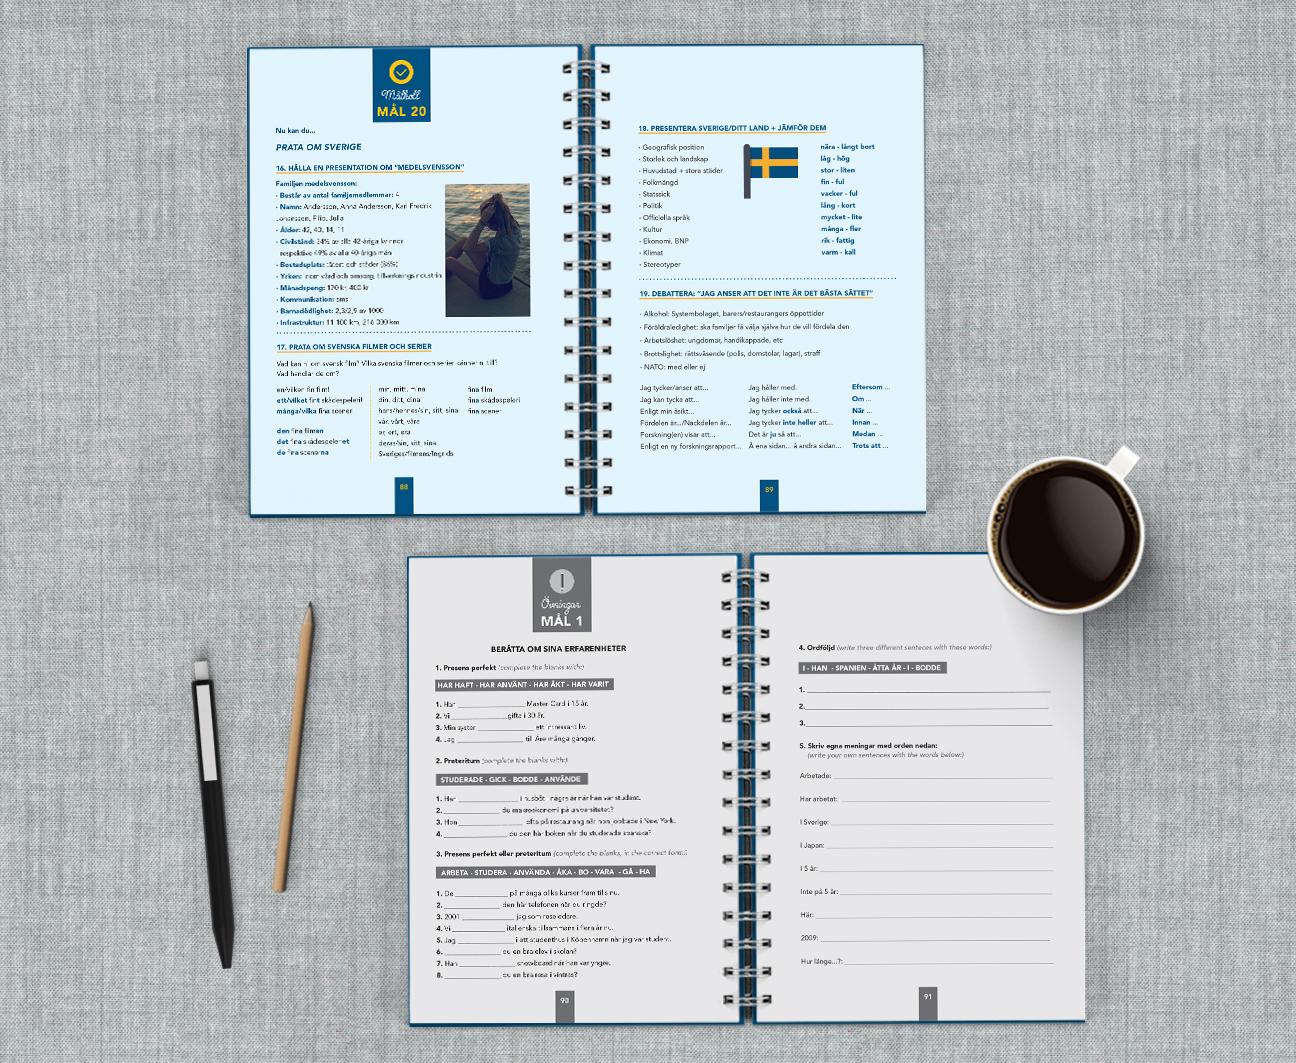 svenska4-openbook-editorial-swedish-berlitz.jpg